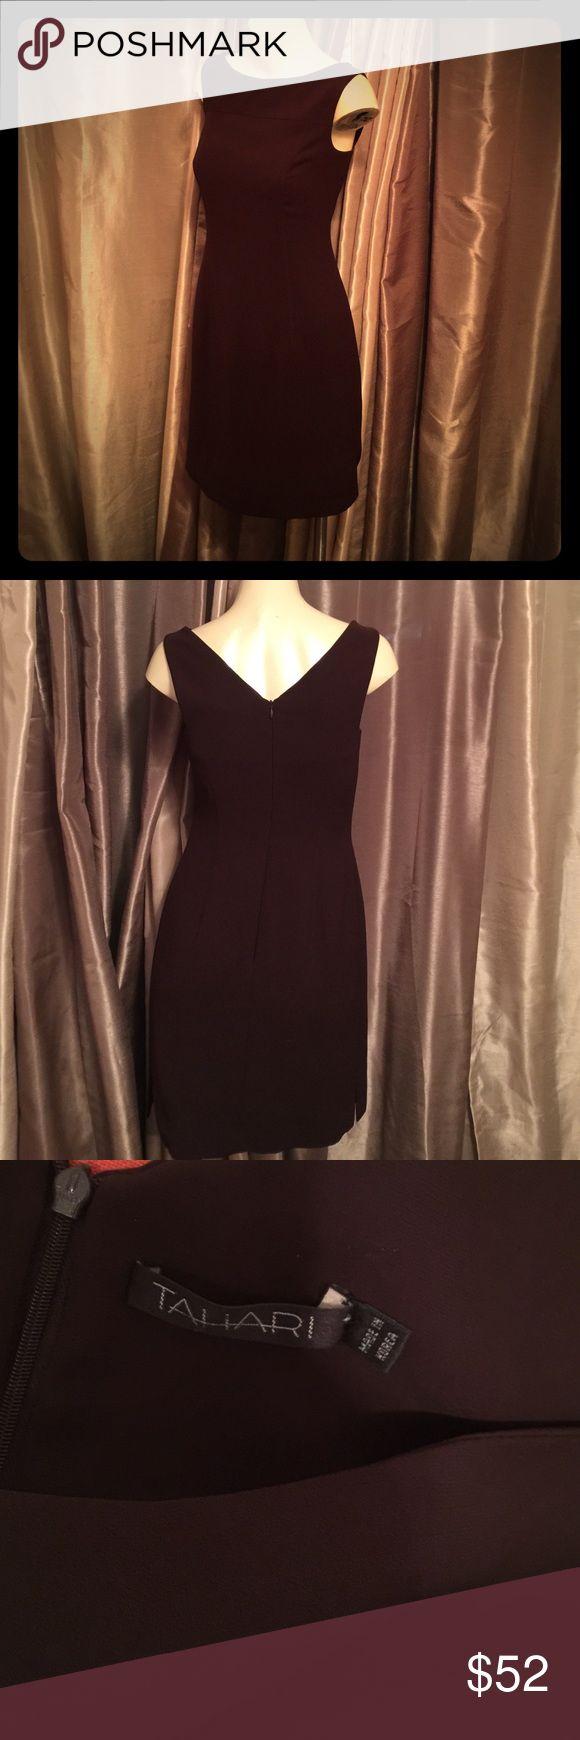 Tahari dress! Like new! Brown work dress! Size 4! Excellent condition! Tahari Dresses